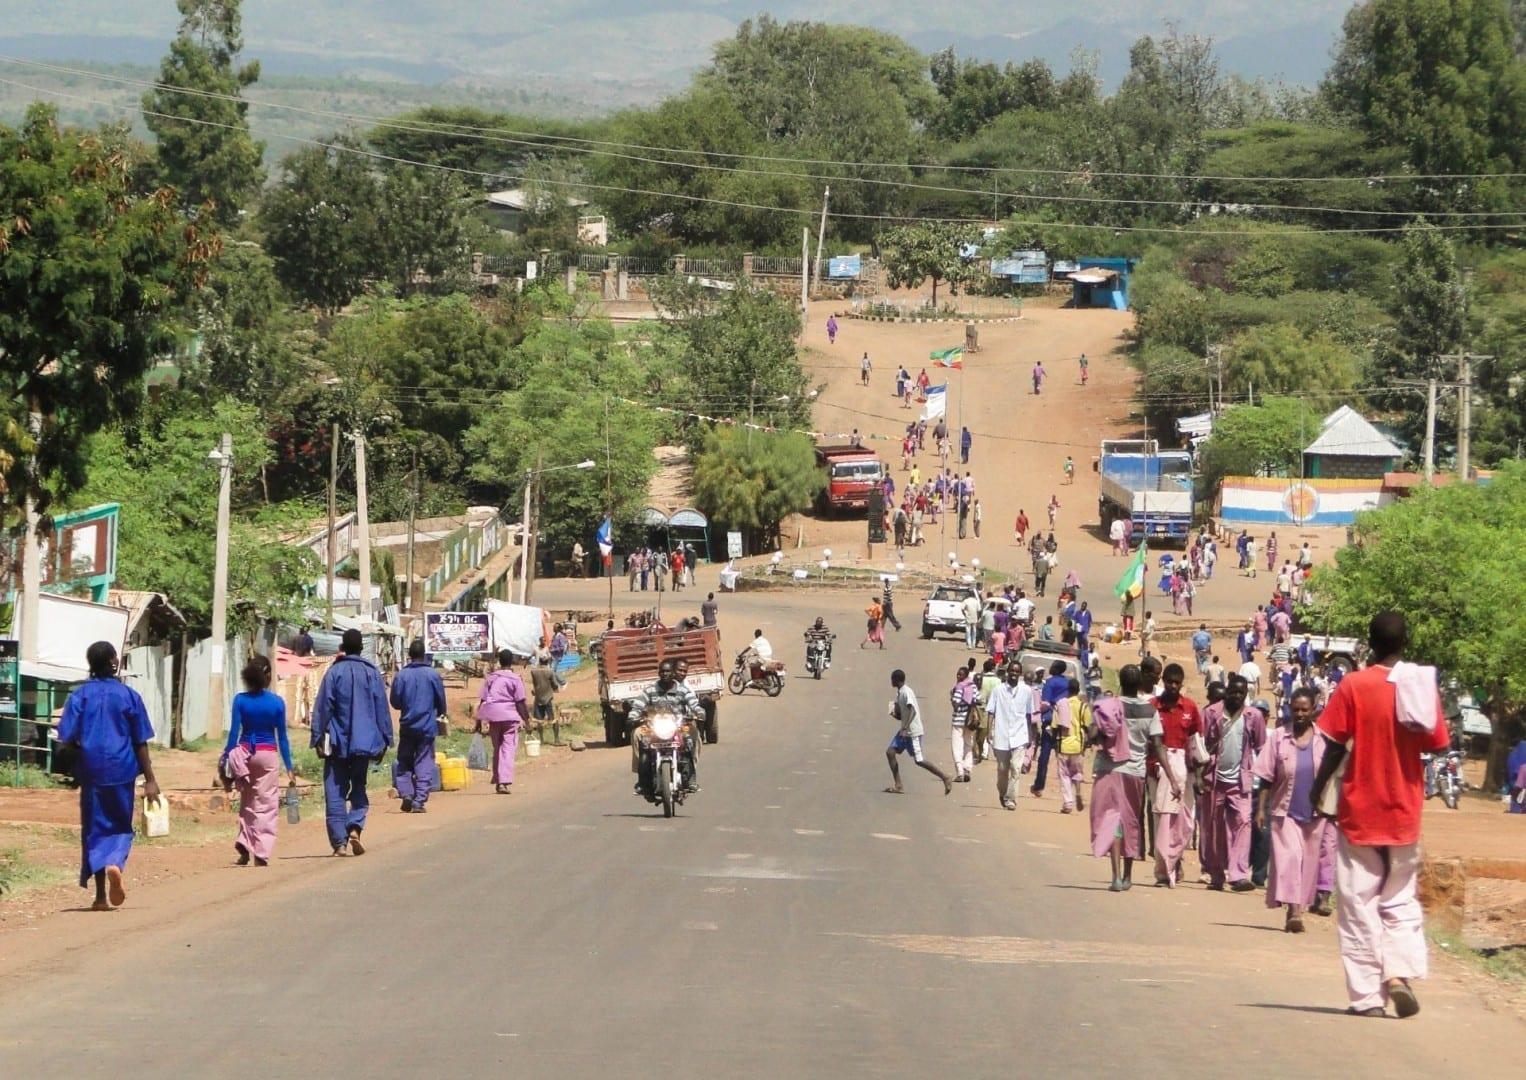 Vista de la calle Konso Etiopía